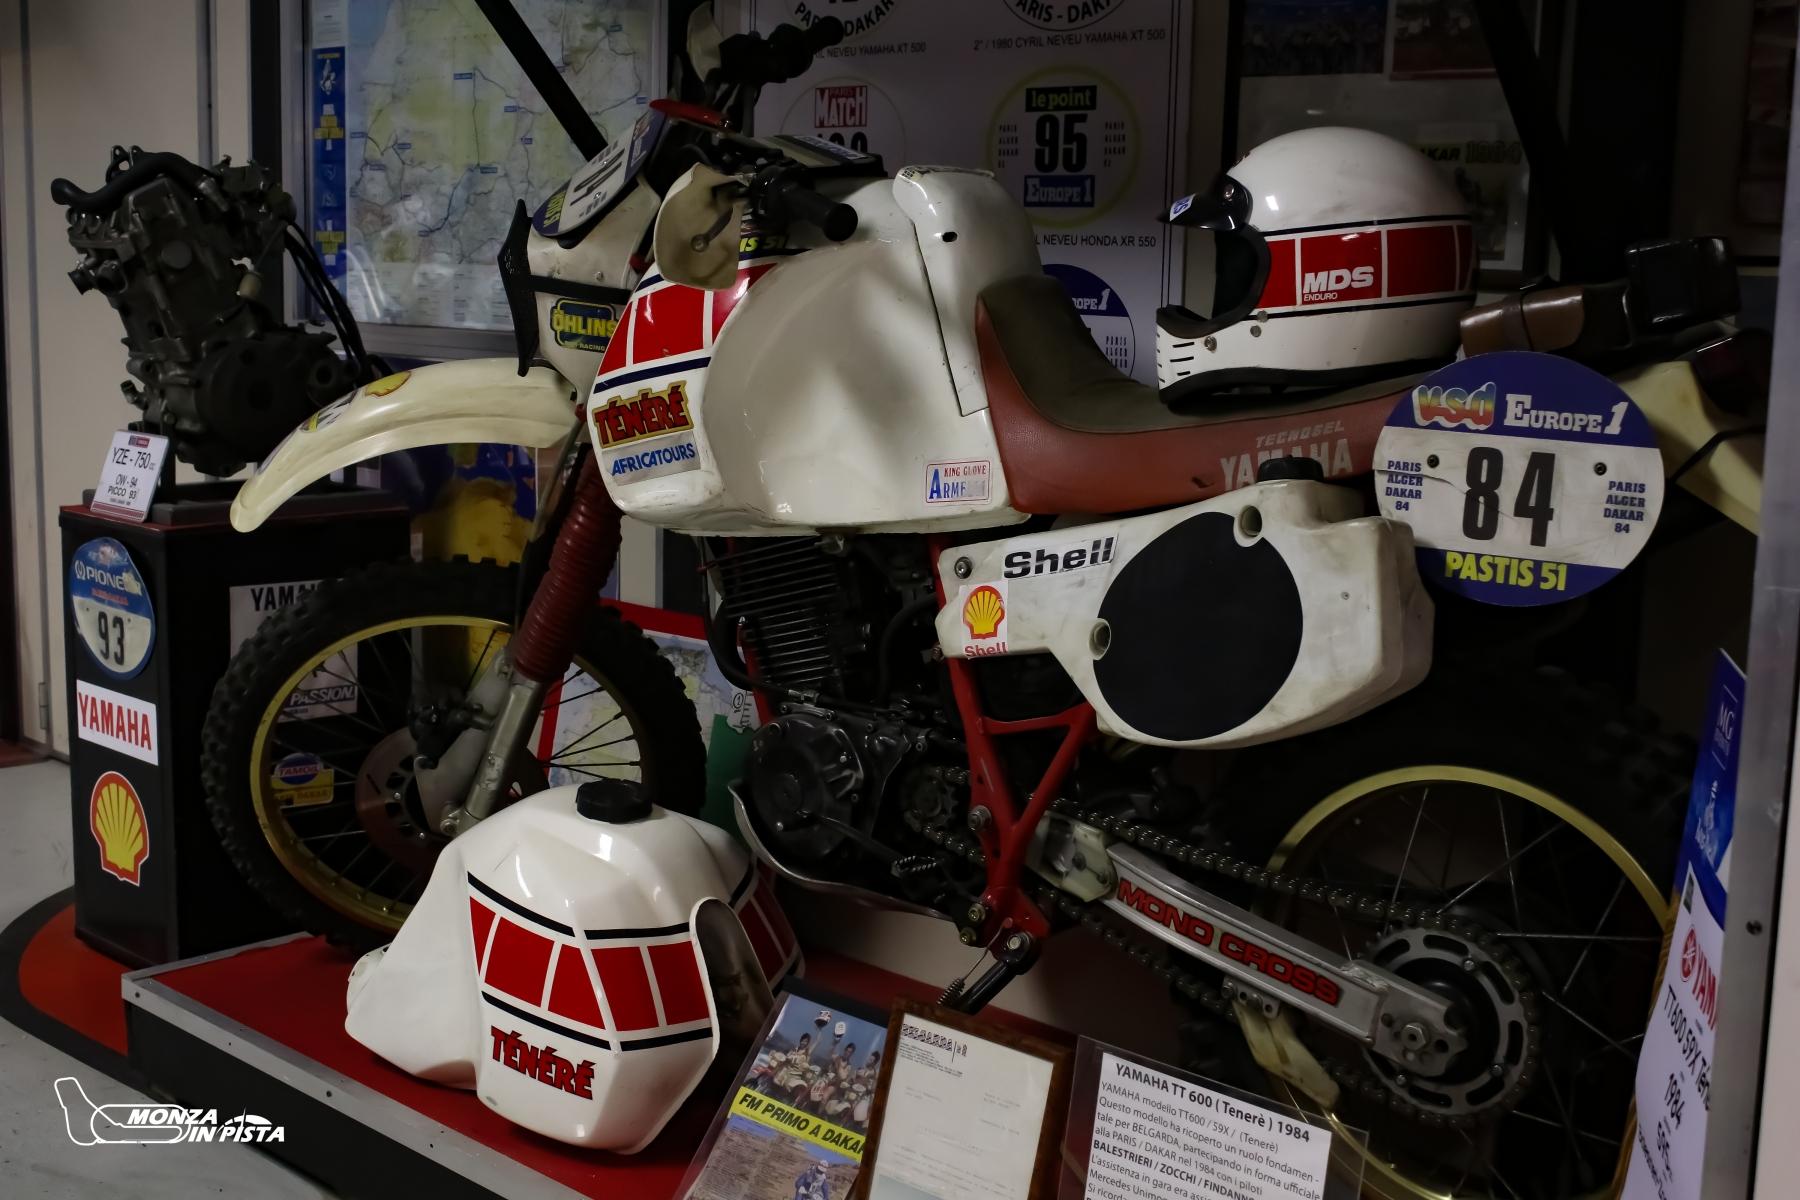 Museo Dune Motor